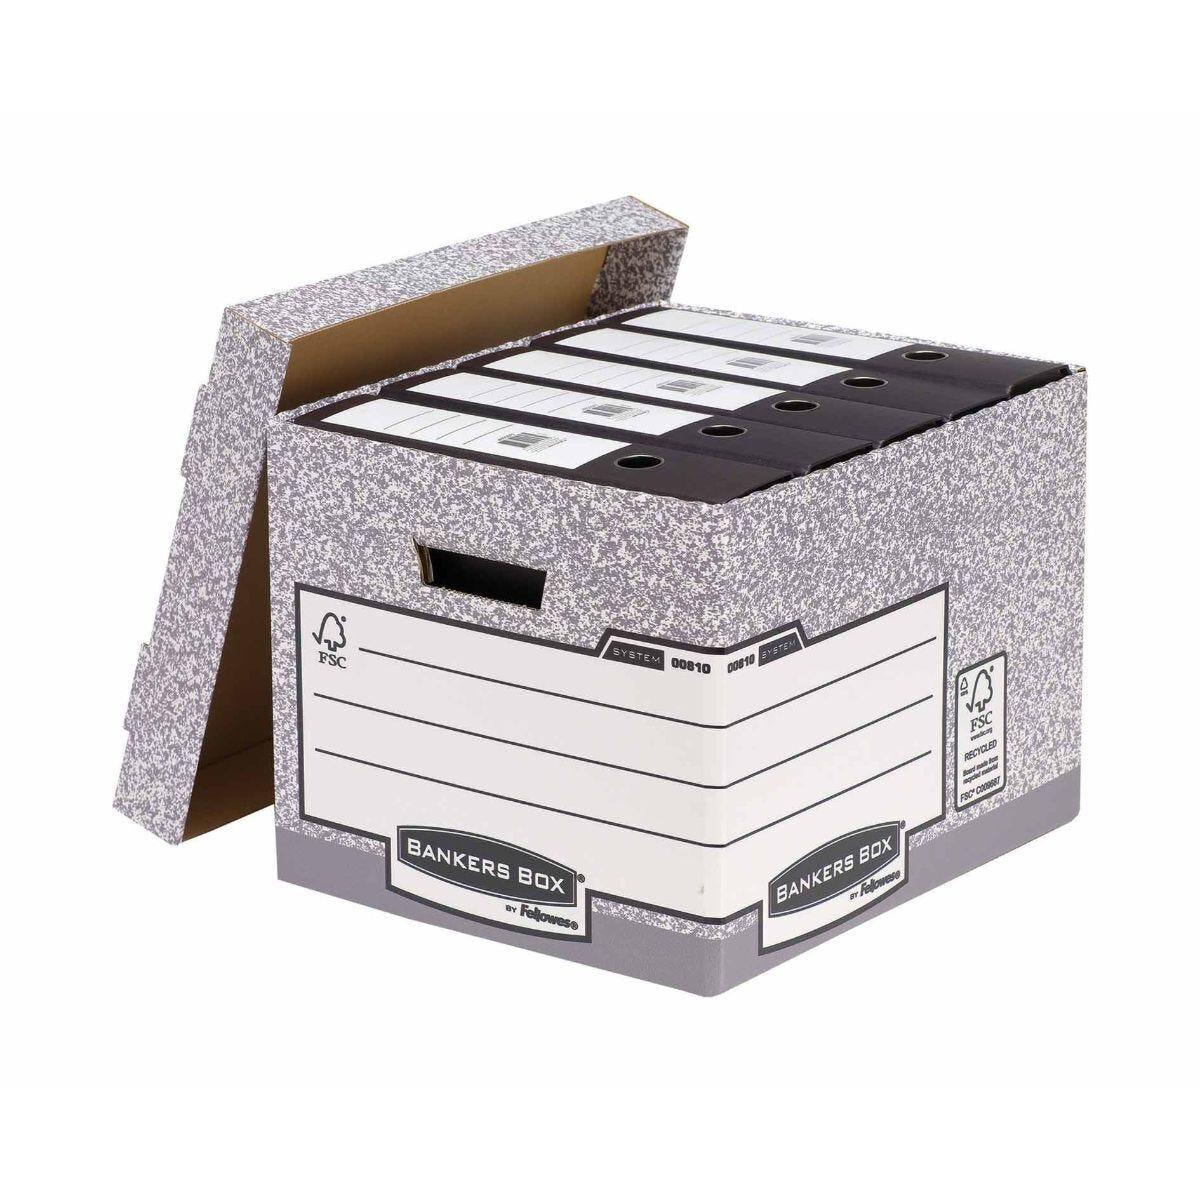 Fellowes Bankers Box Cardboard Storage Box Medium-Duty Pack of 2